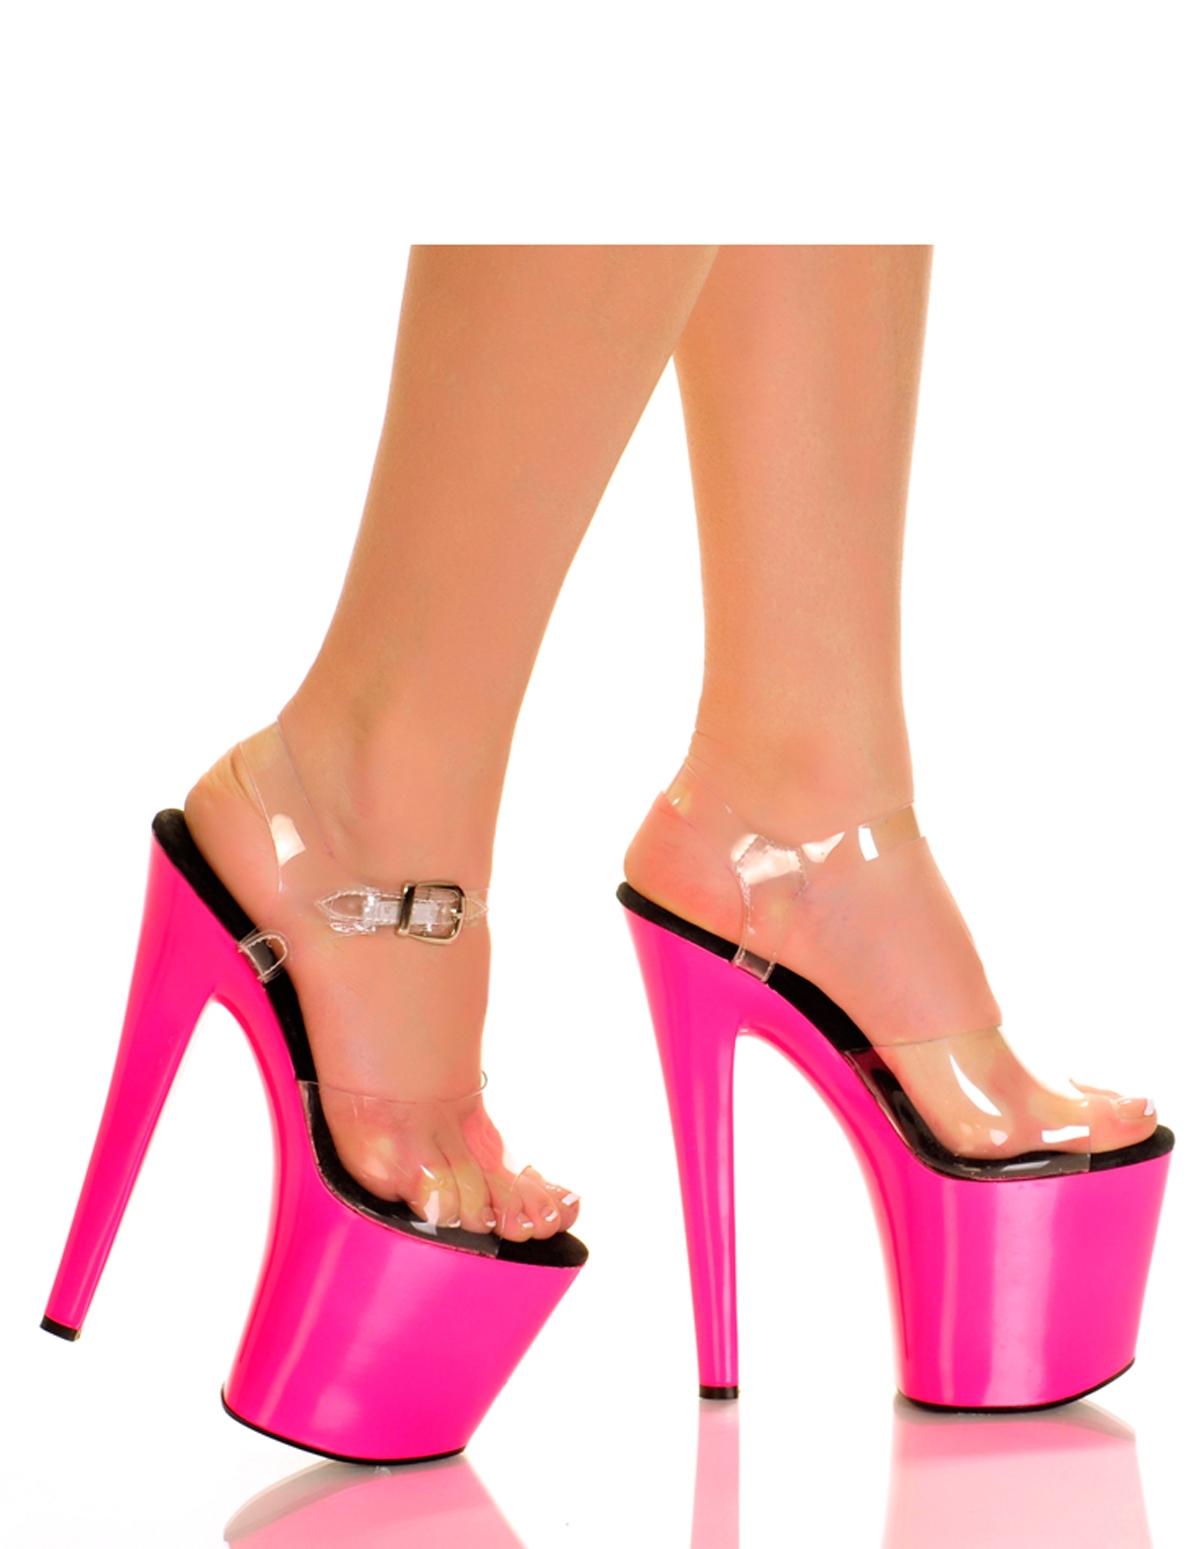 Glow-161 Shoe